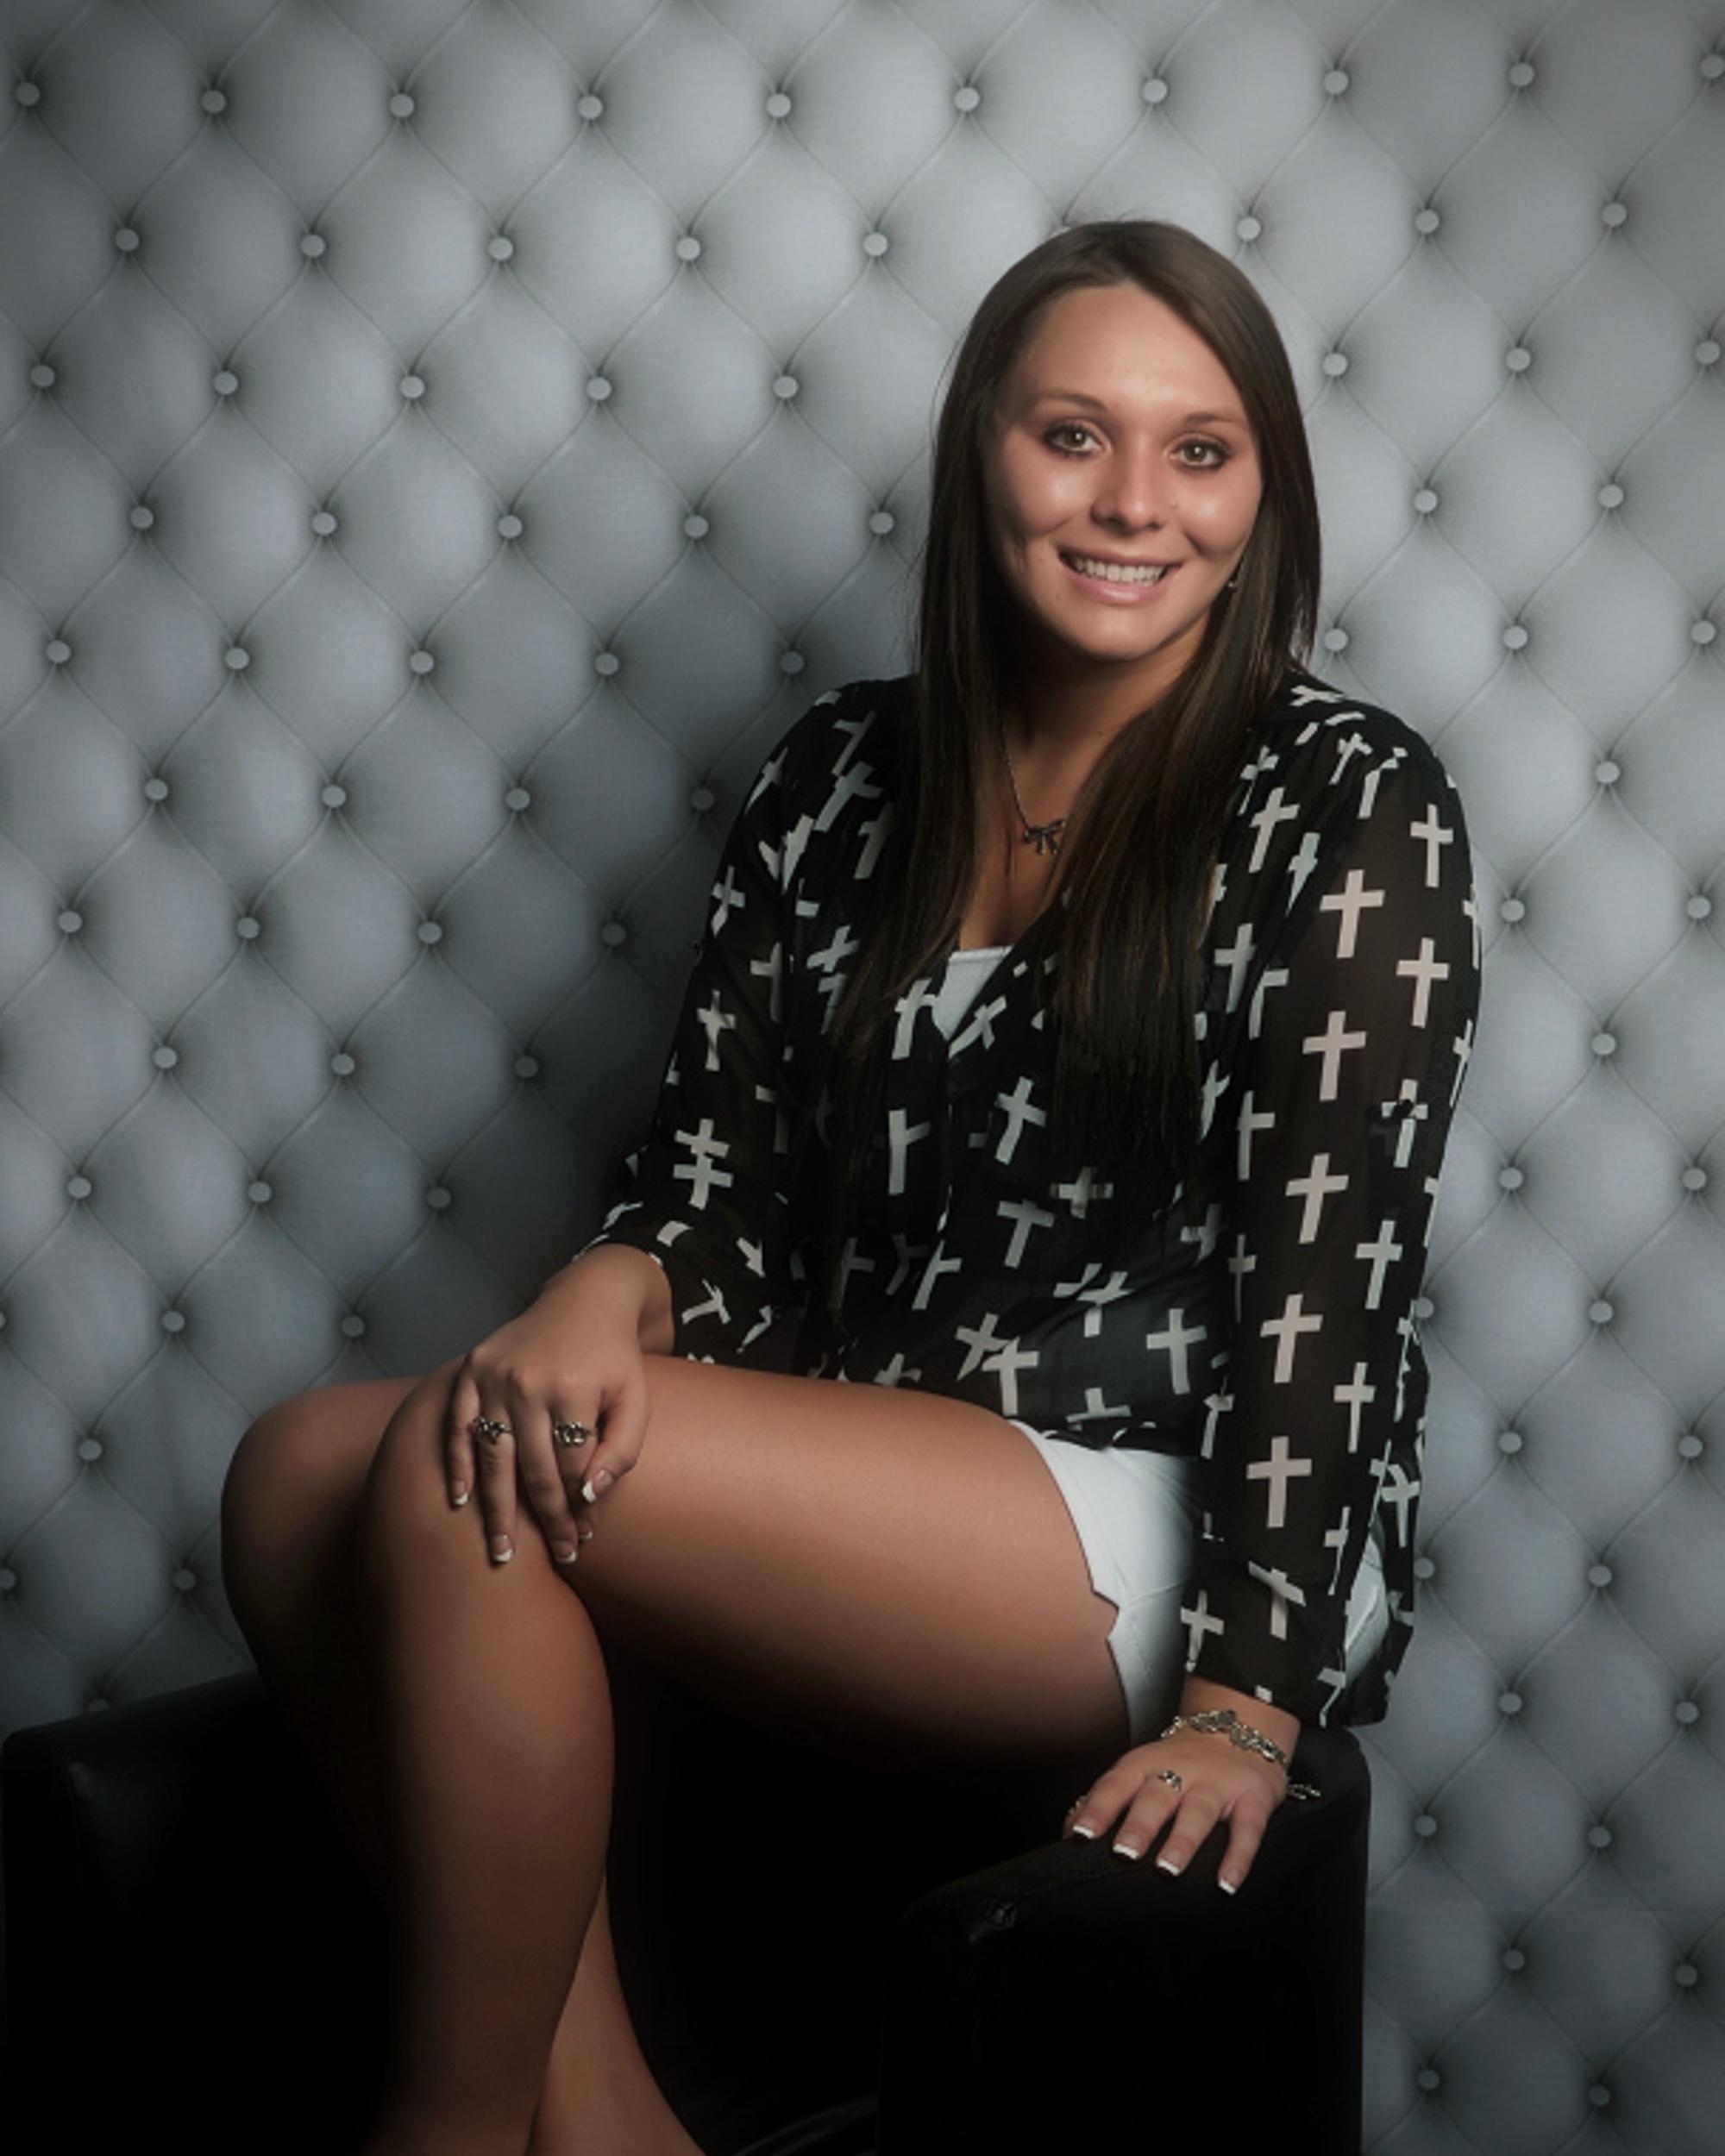 Natalie - 2014 attends Alamo College